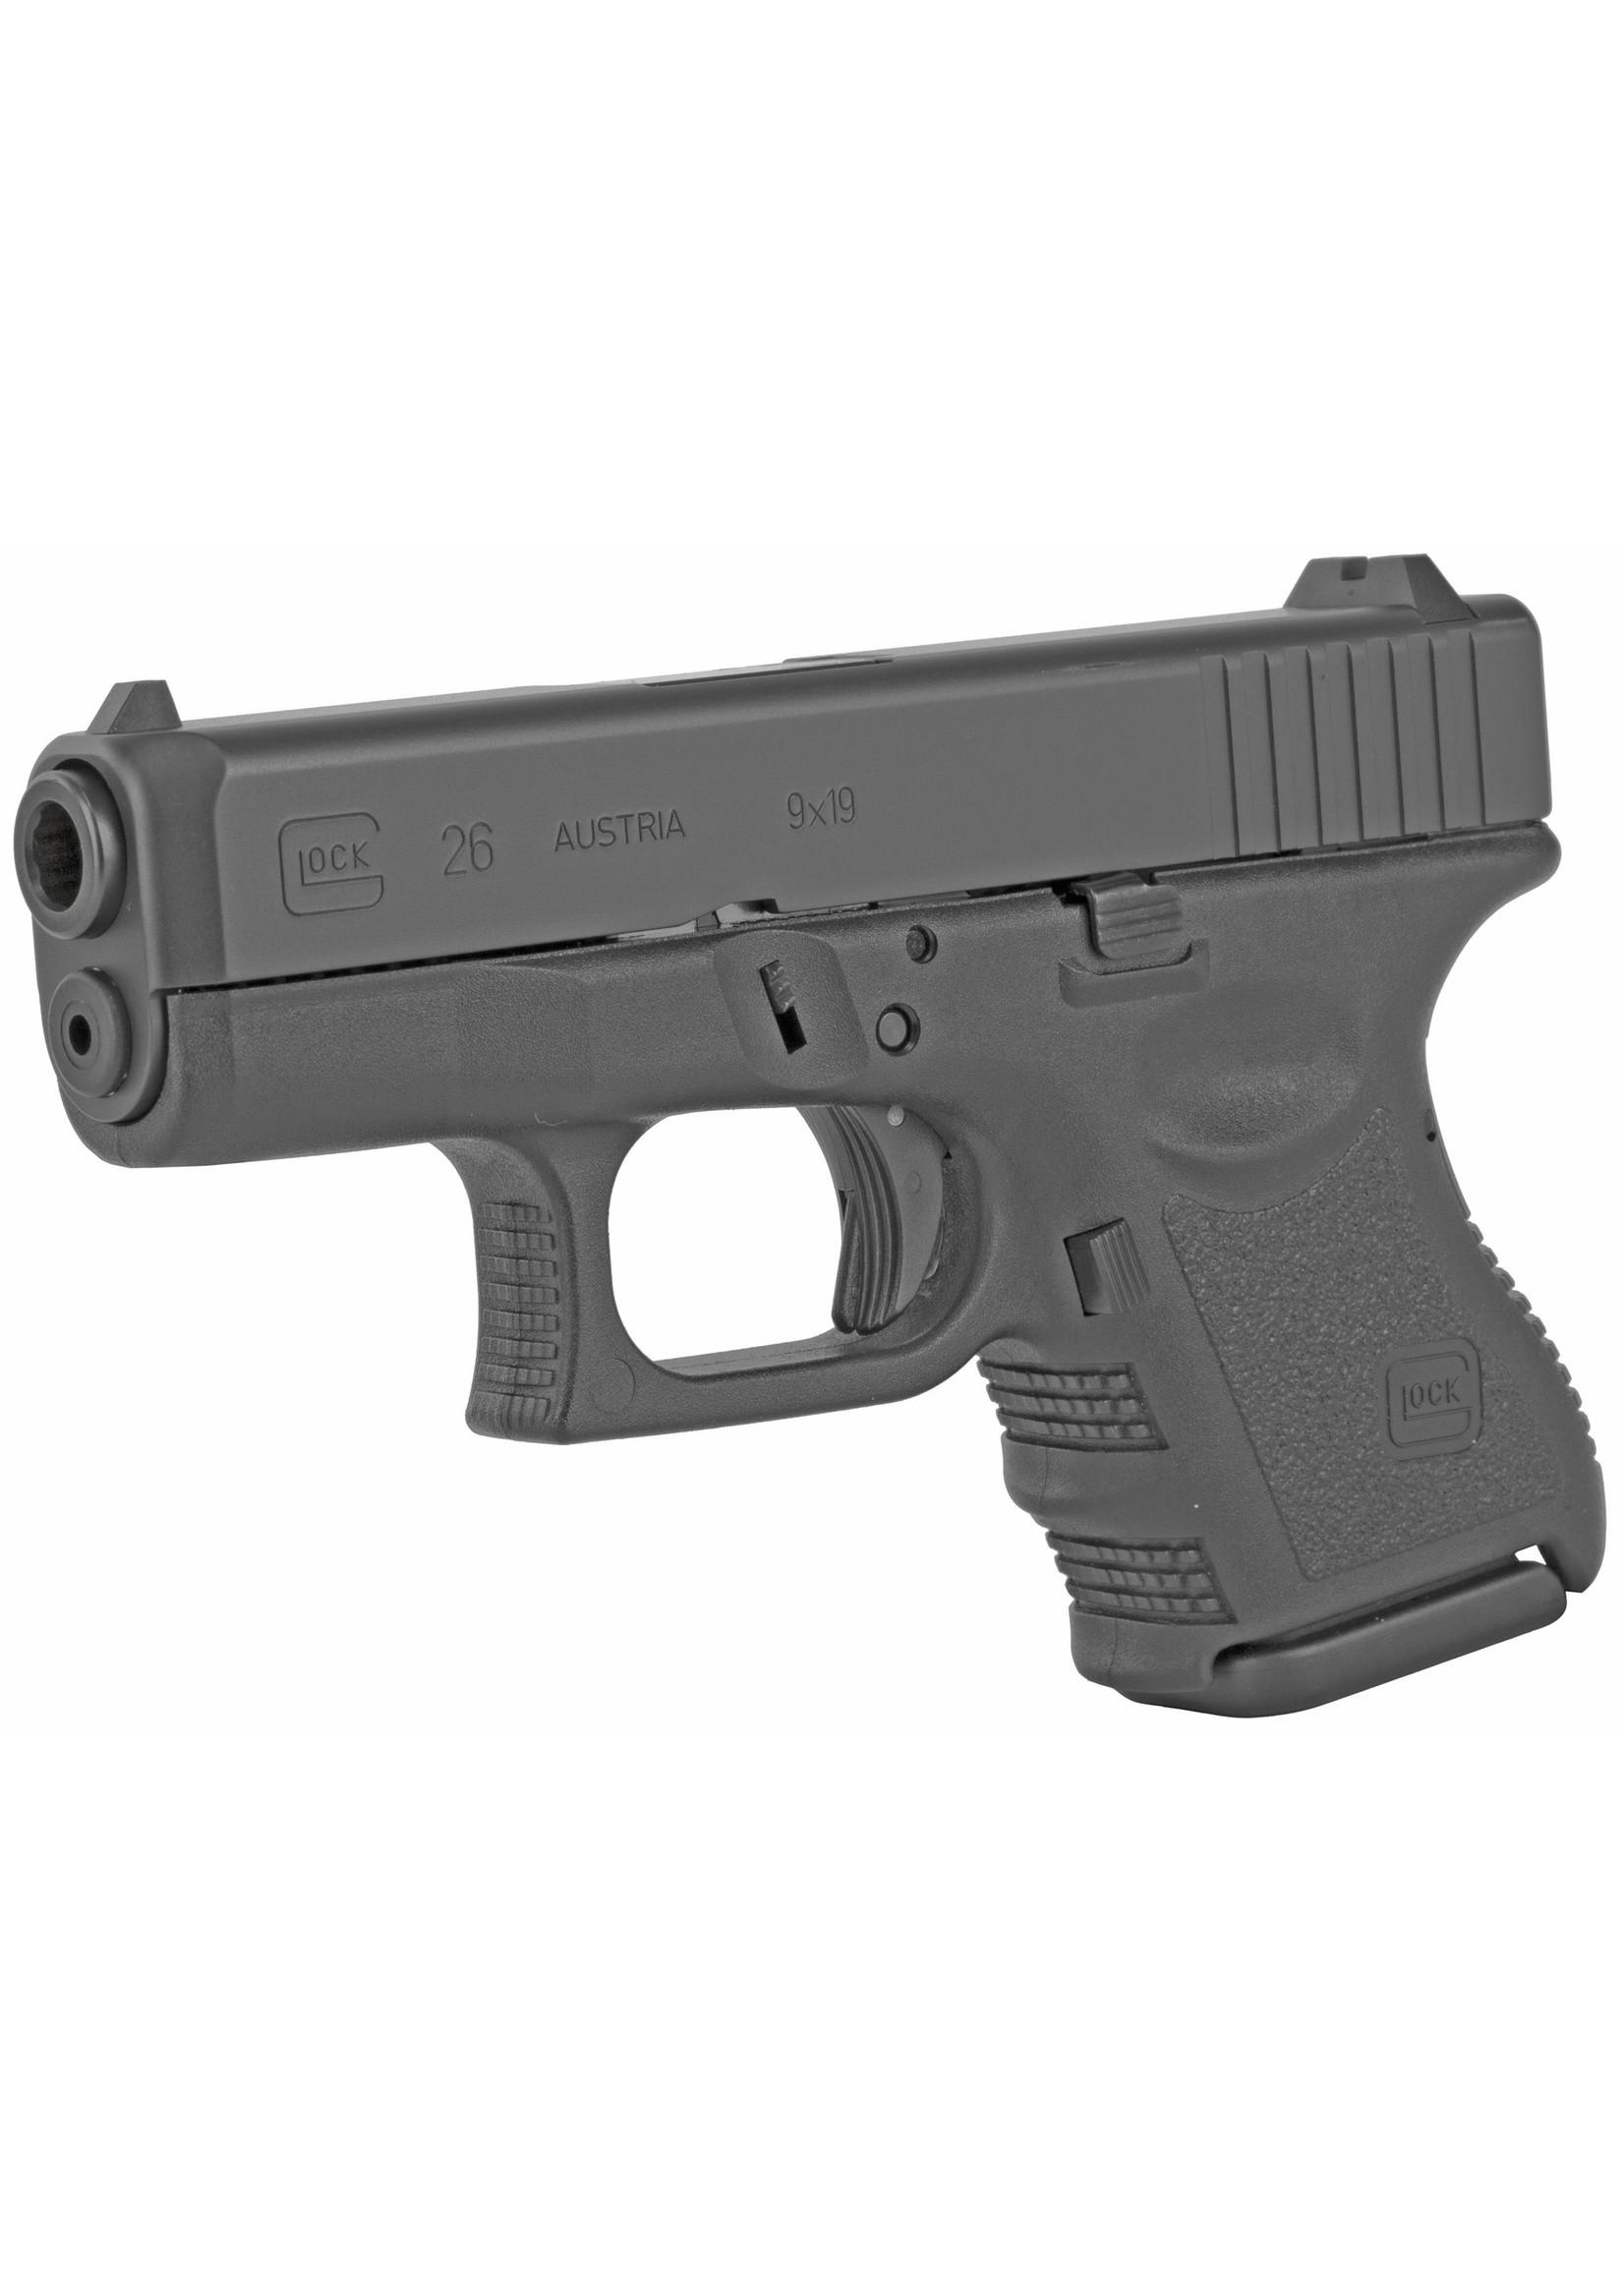 "Glock Glock 26 G3, 9mm, 10+1, 3.5"", Fixed sights, (2) 10rd Magazines, 9mm"